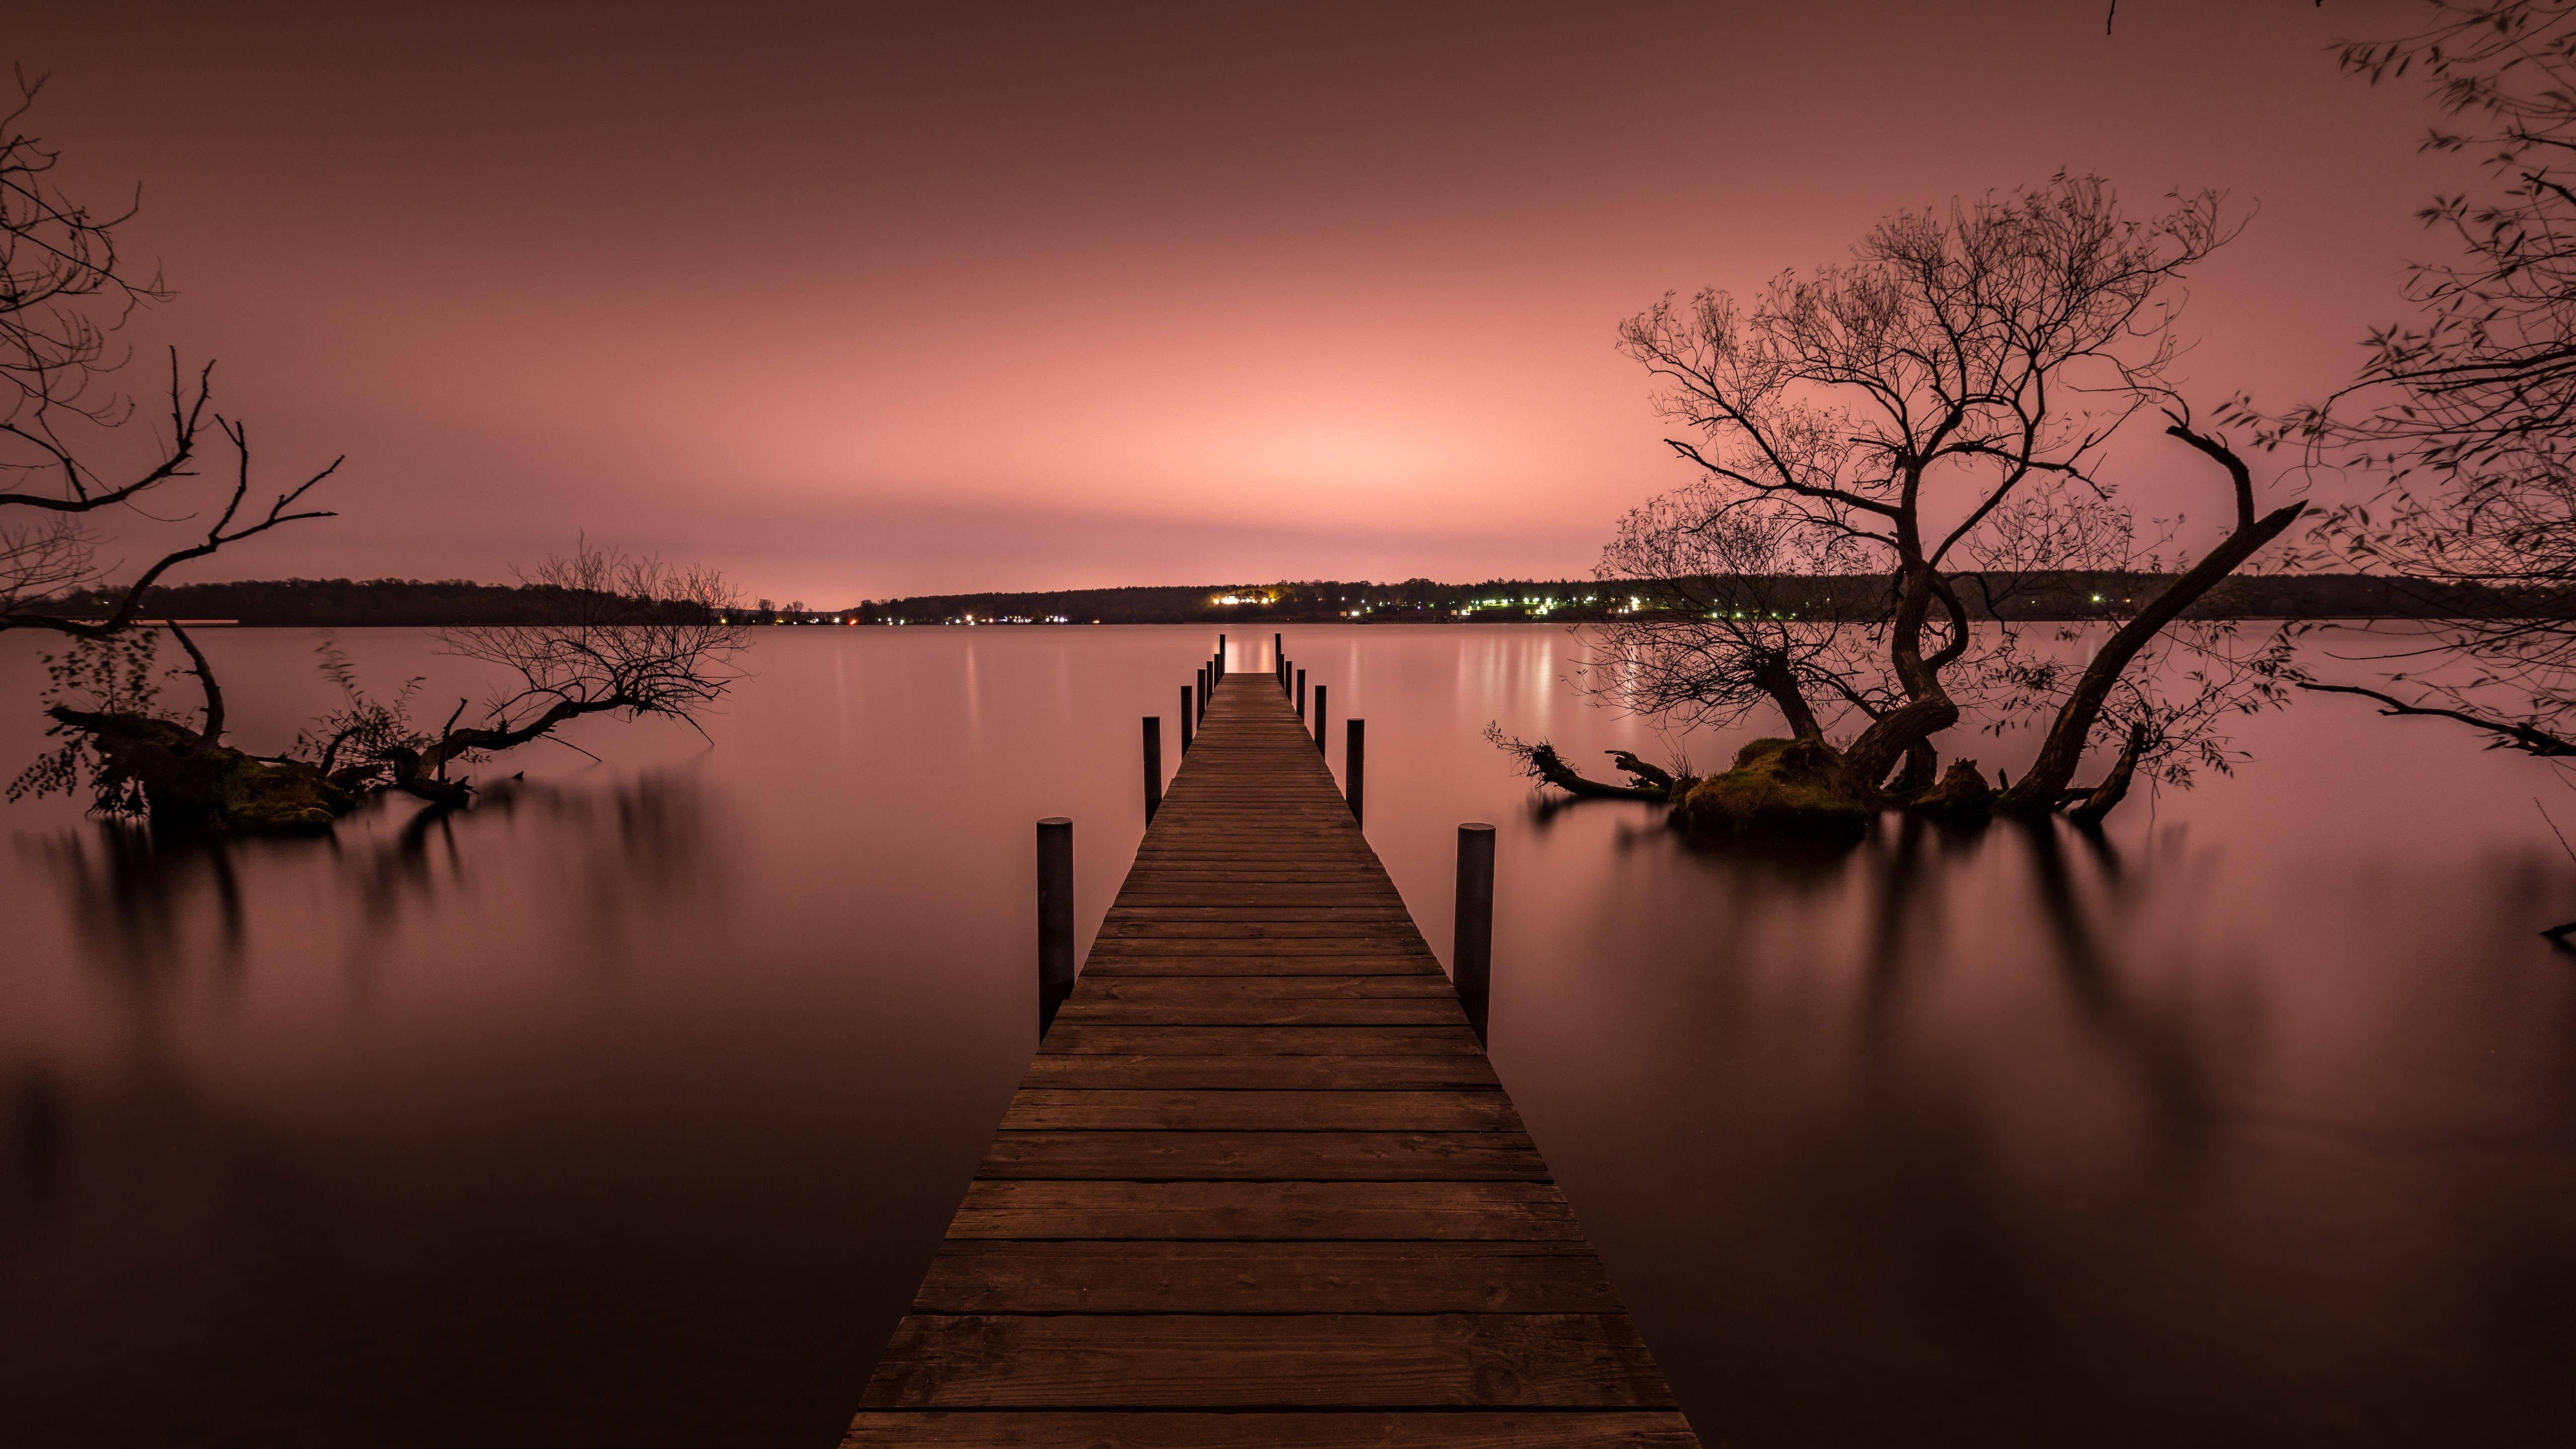 Pier Silent Calm Lake Reflection Water Pink Sky Sunset Evening Dusk Tree 5k Wallpaper Hdwallpaper Desktop Pink Sky Sunset Wallpaper Hd Wallpaper